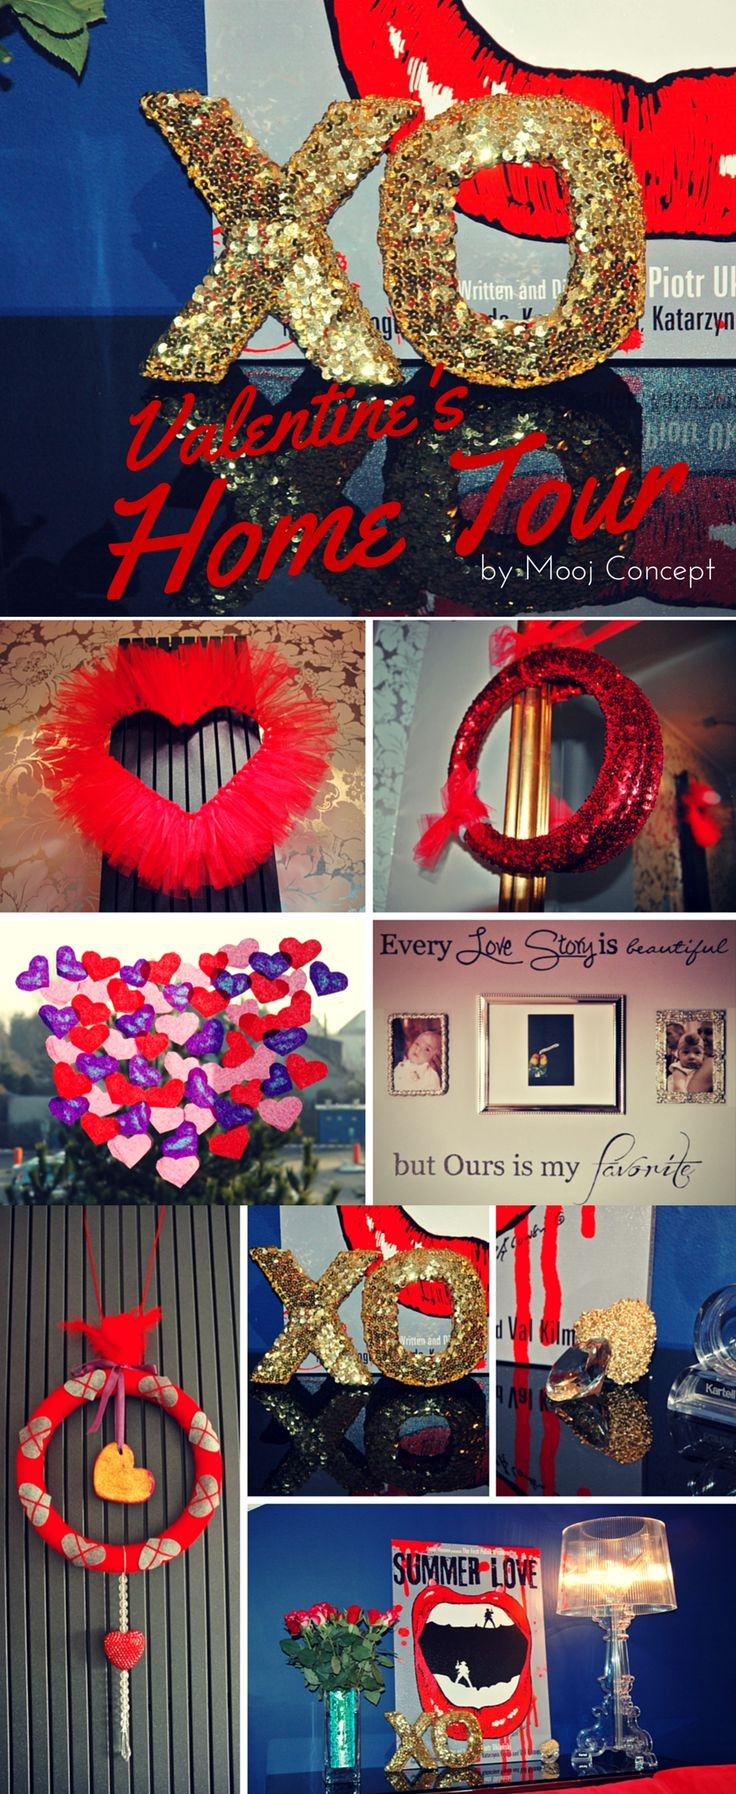 Valentine's Home Tour by Mooj Concept https://www.facebook.com/MoojConcept